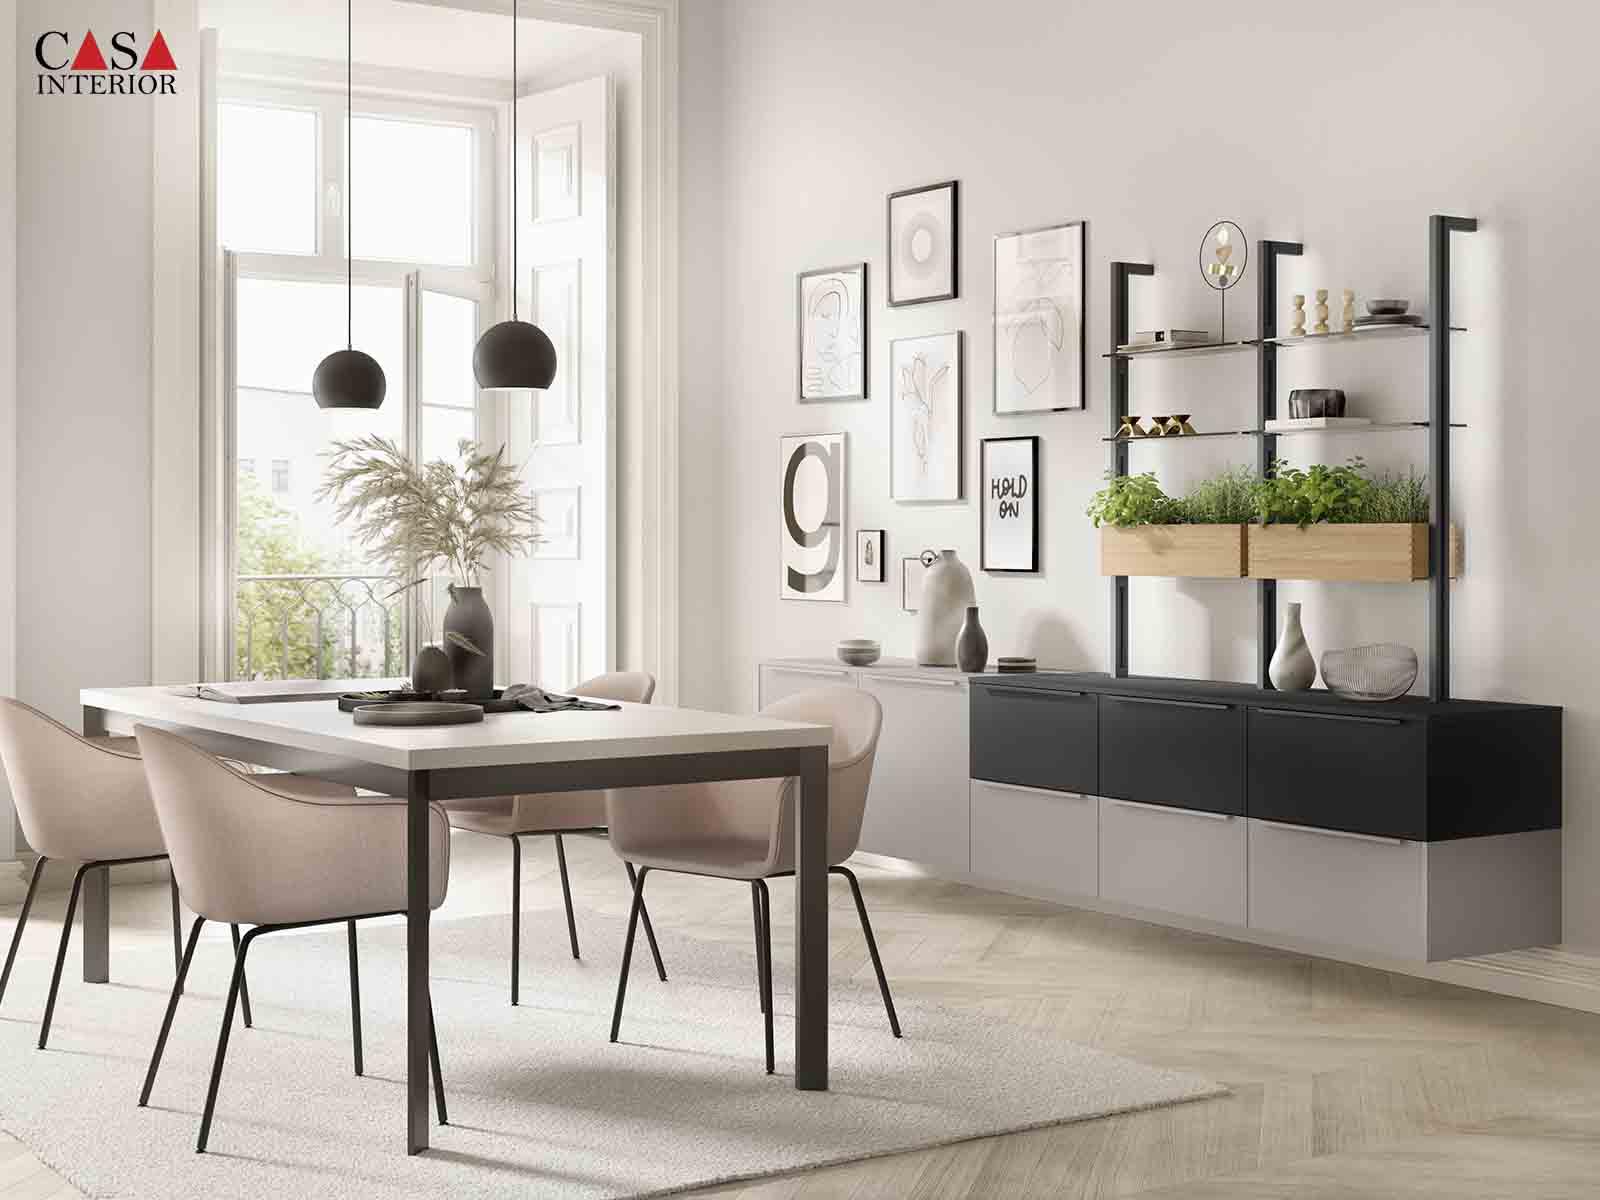 Küchentime - Livingrooms - Moments of enjoyment